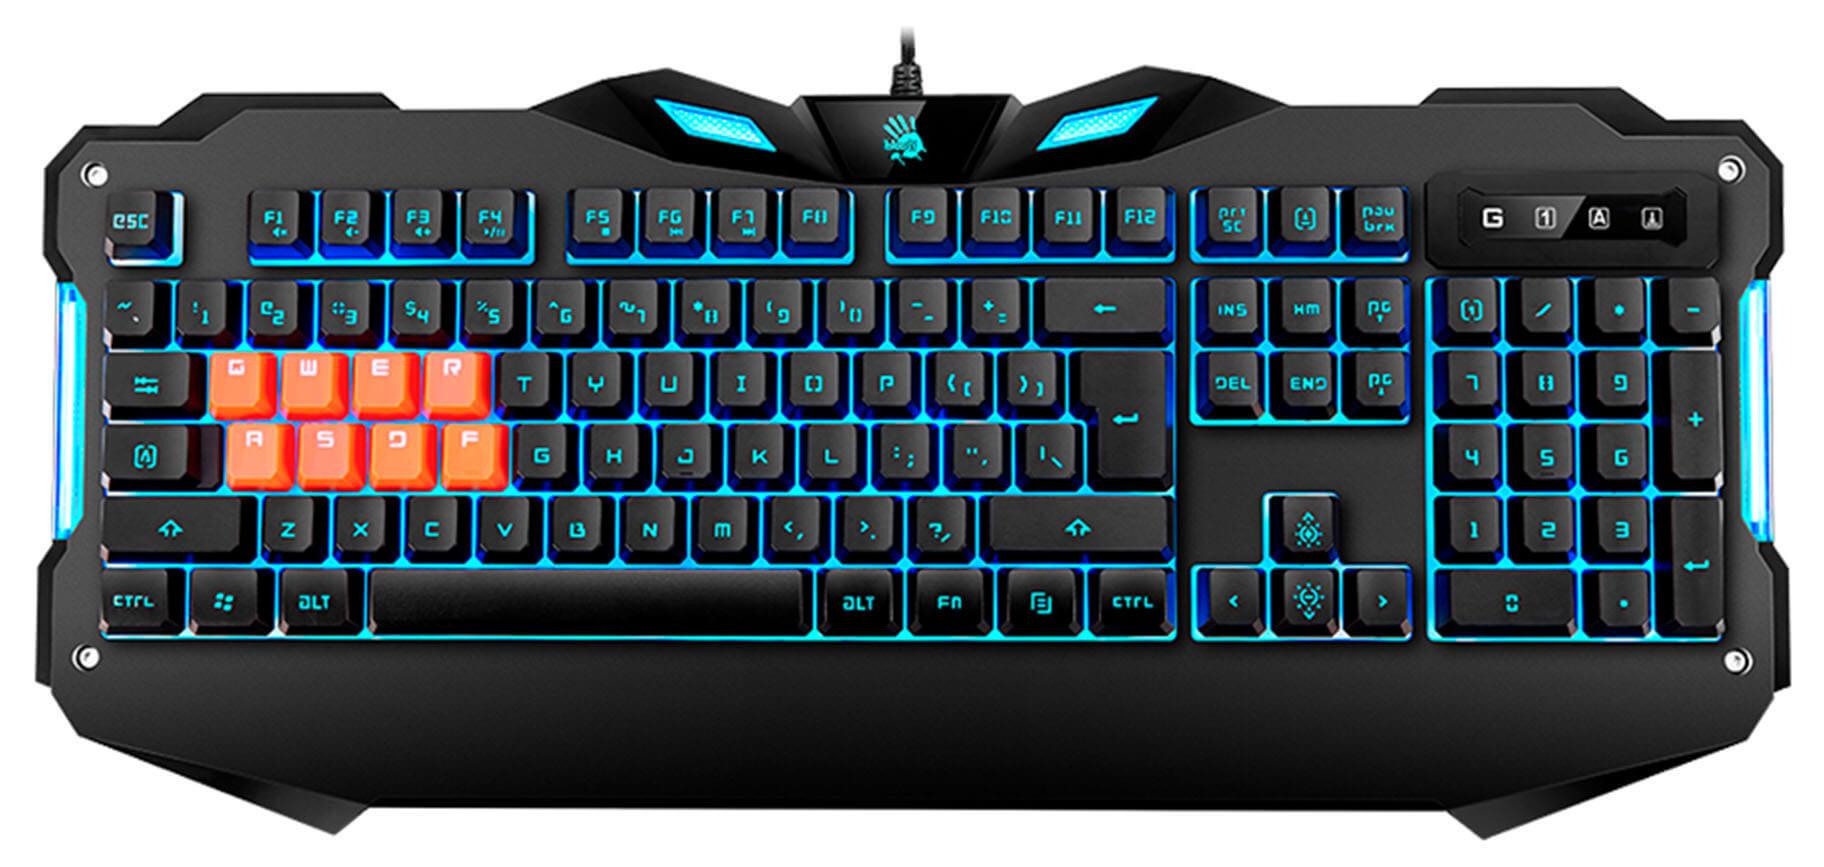 Клавиатура A4 Bloody B328 черный USB for gamer LED